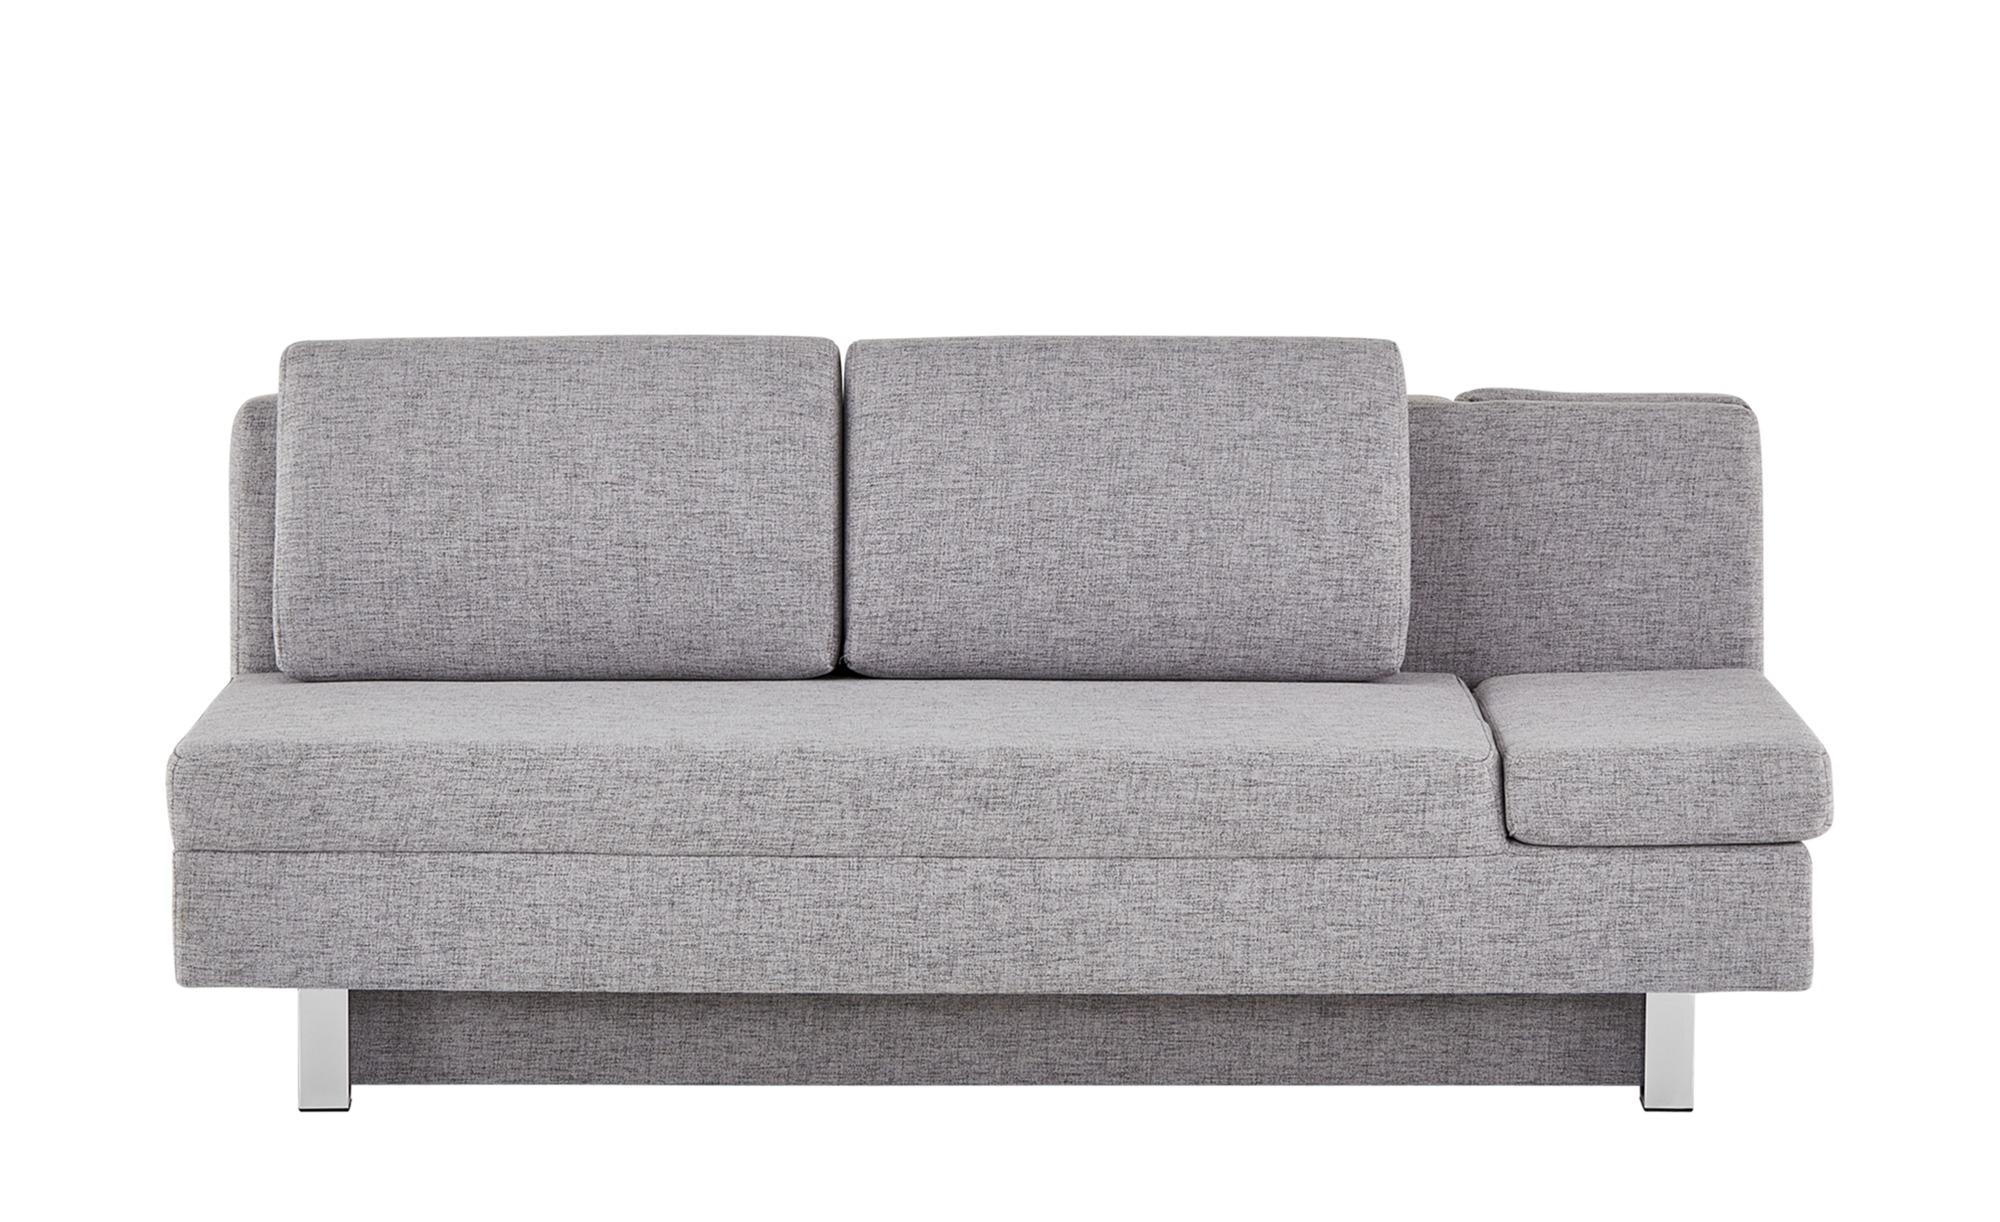 Schlafsofa  Tino ¦ grau ¦ Maße (cm): B: 200 H: 90 T: 97 Polstermöbel > Sofas > 2-Sitzer - Höffner